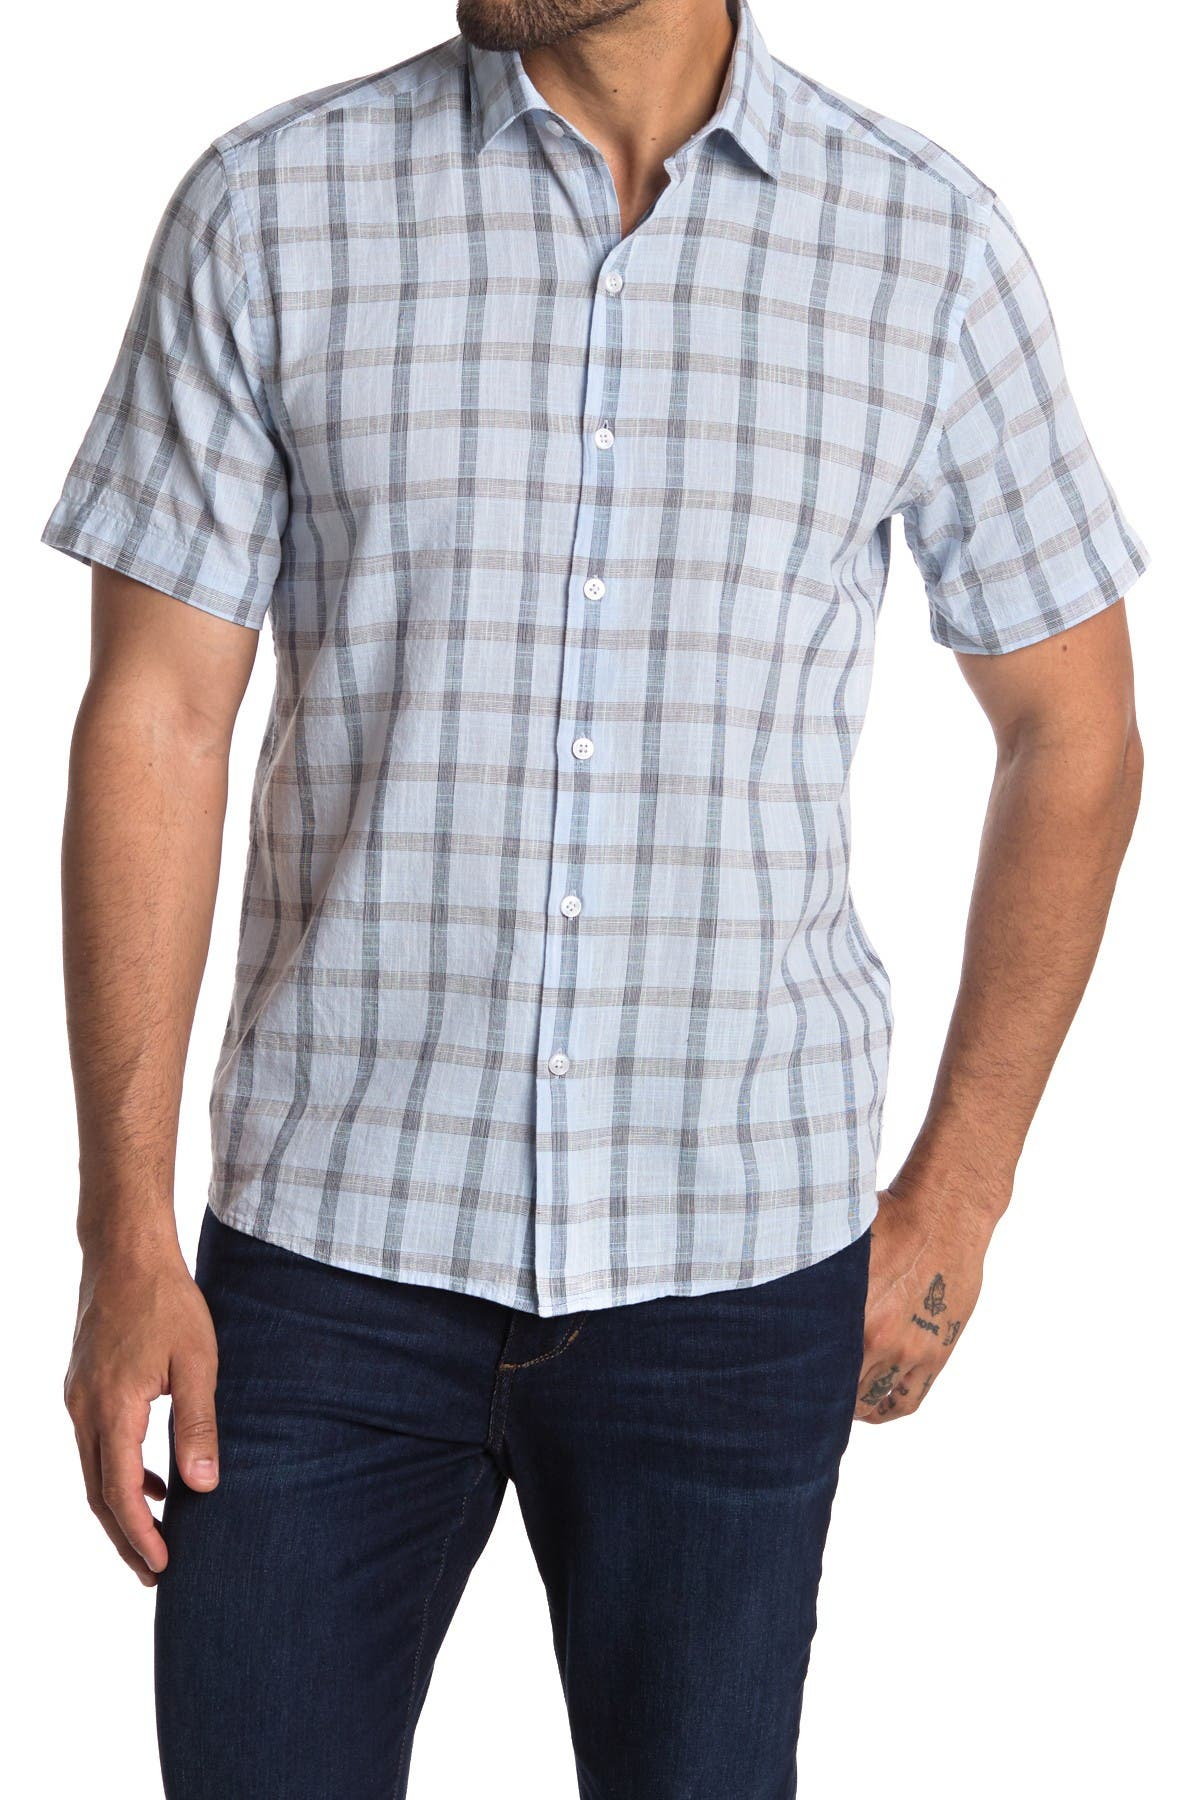 Image of ROBERT BARAKETT Fairfield Plaid Print Short Sleeve Shirt